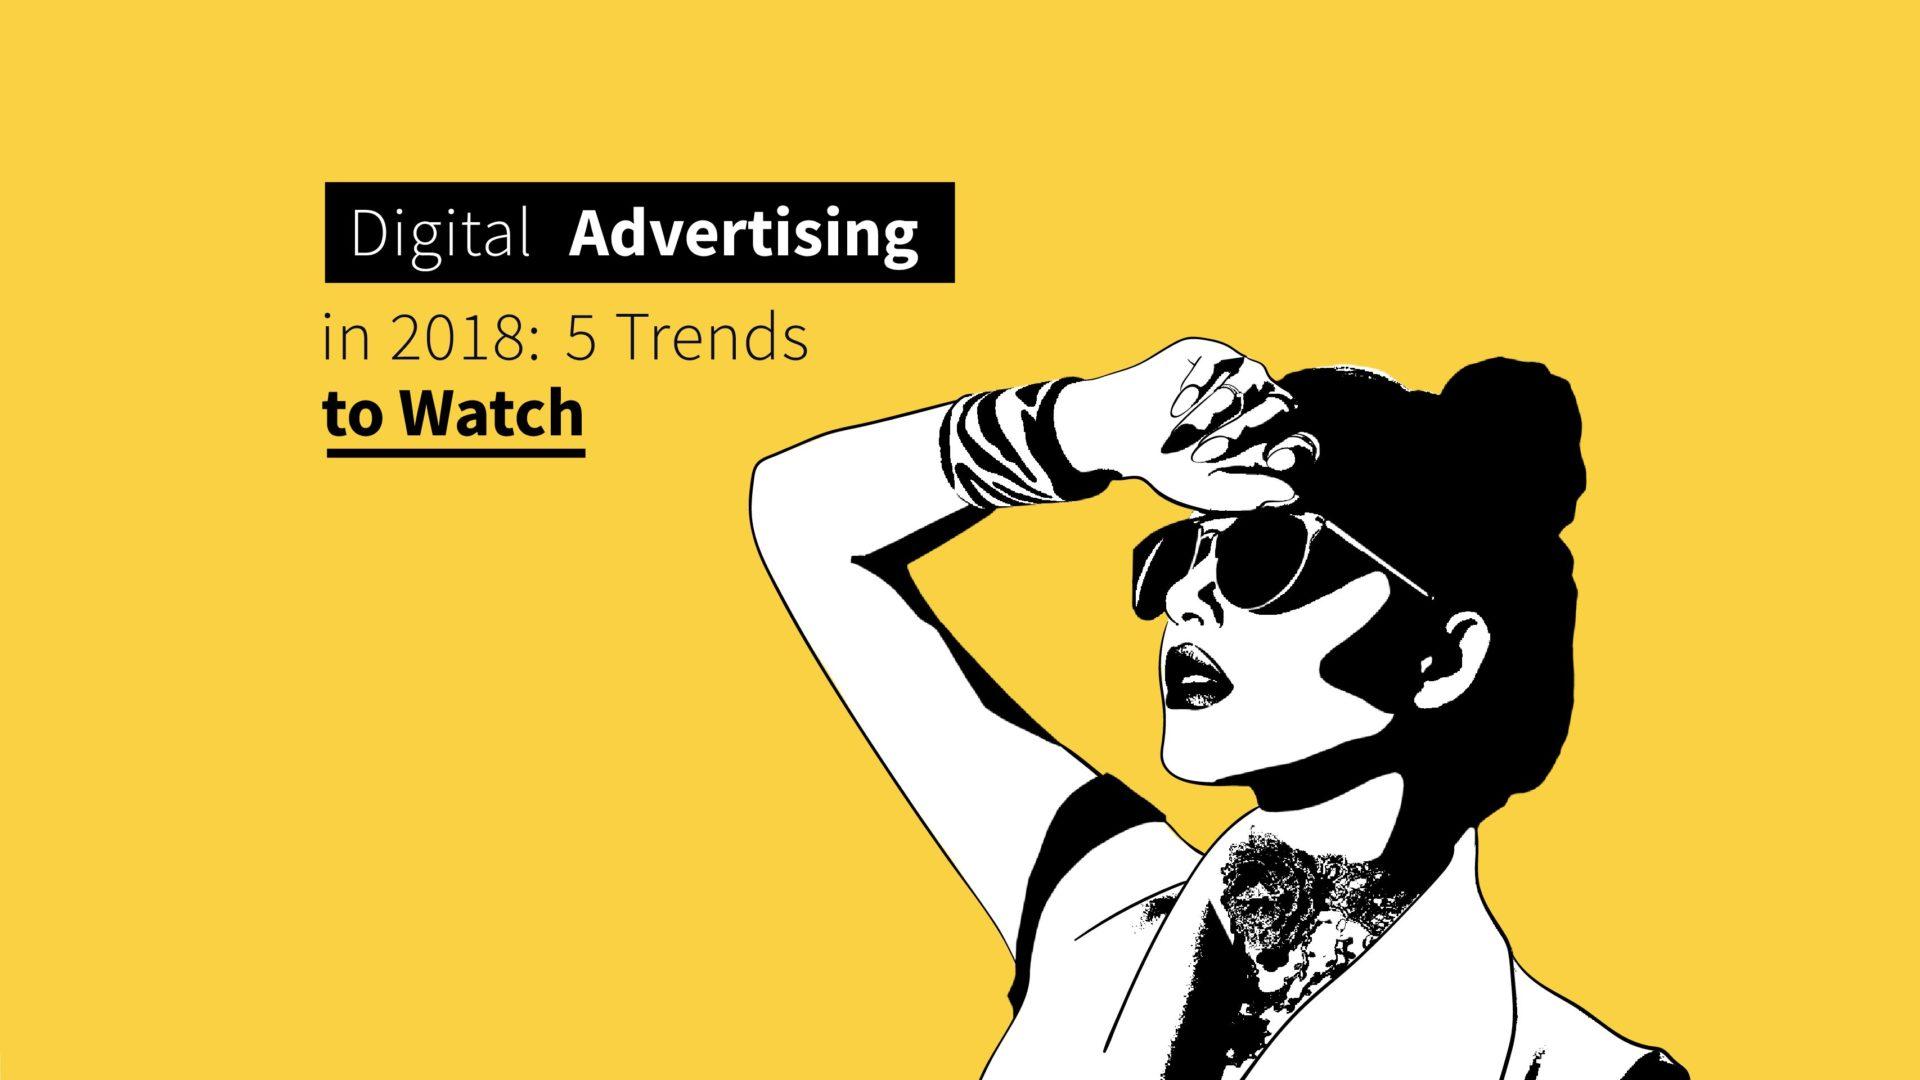 Digital Advertising Trends in 2018: 5 Things to Watch